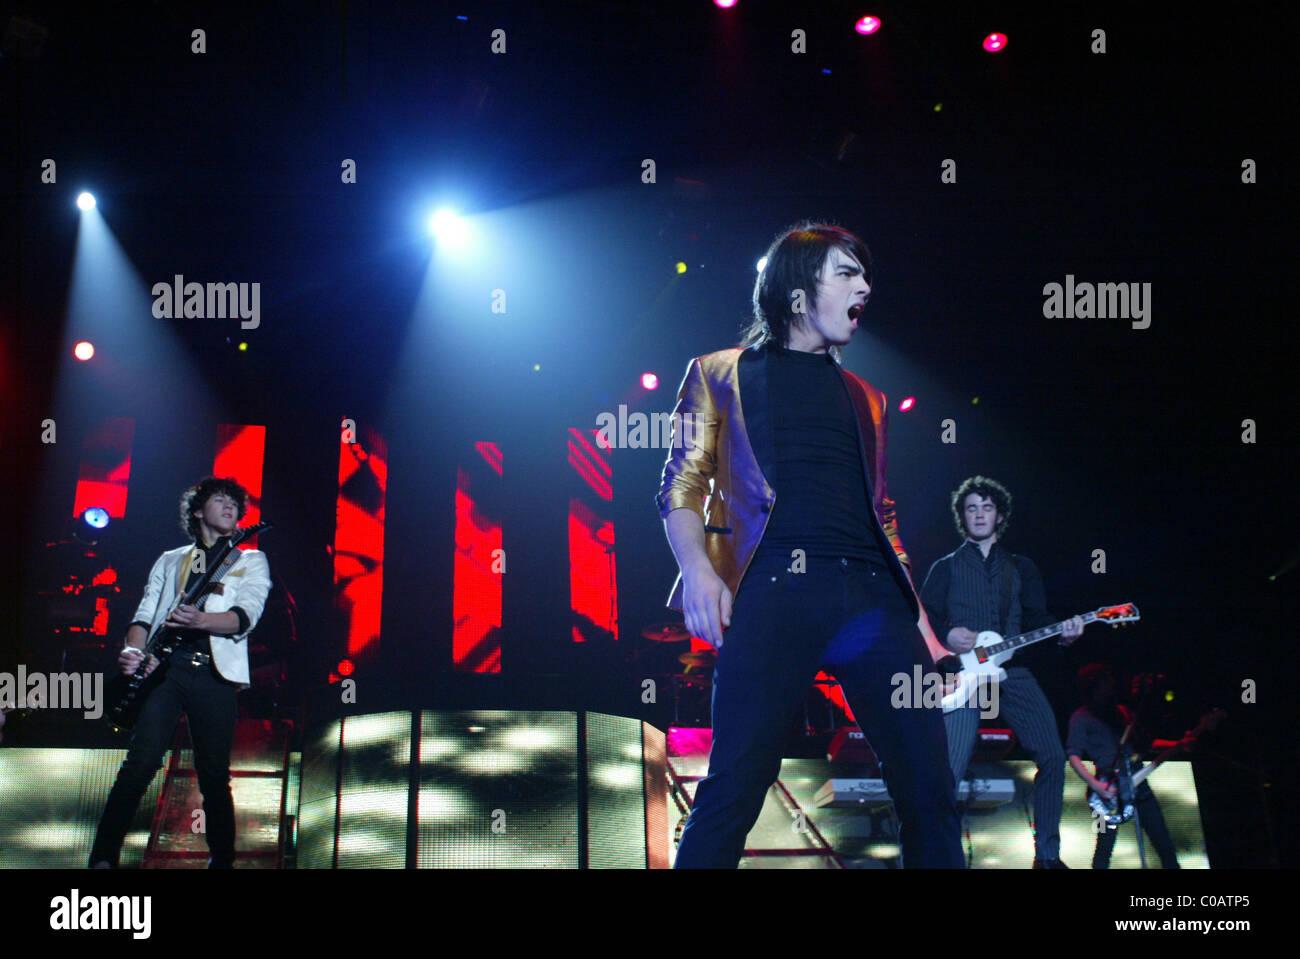 The Jonas Brothers perform at the Patriot Center Washington